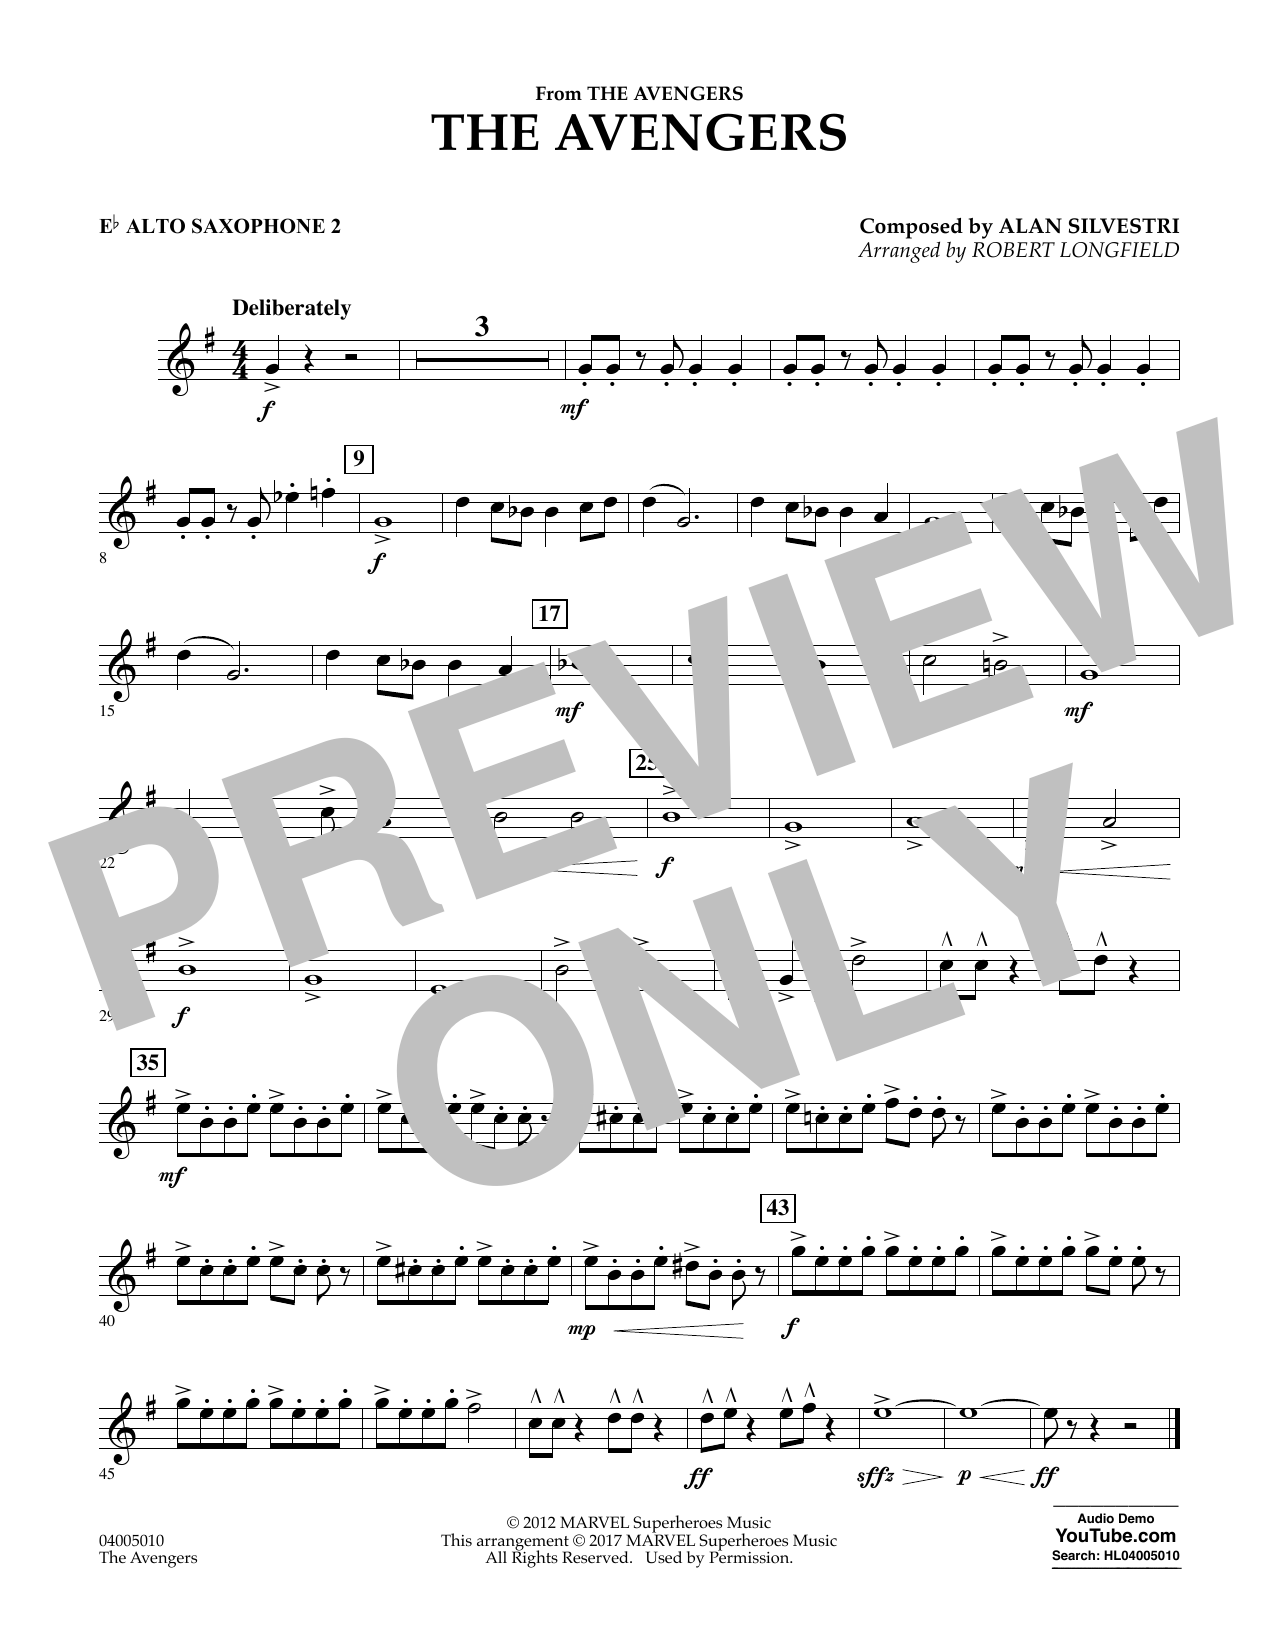 Alan Silvestri - The Avengers - Eb Alto Saxophone 2